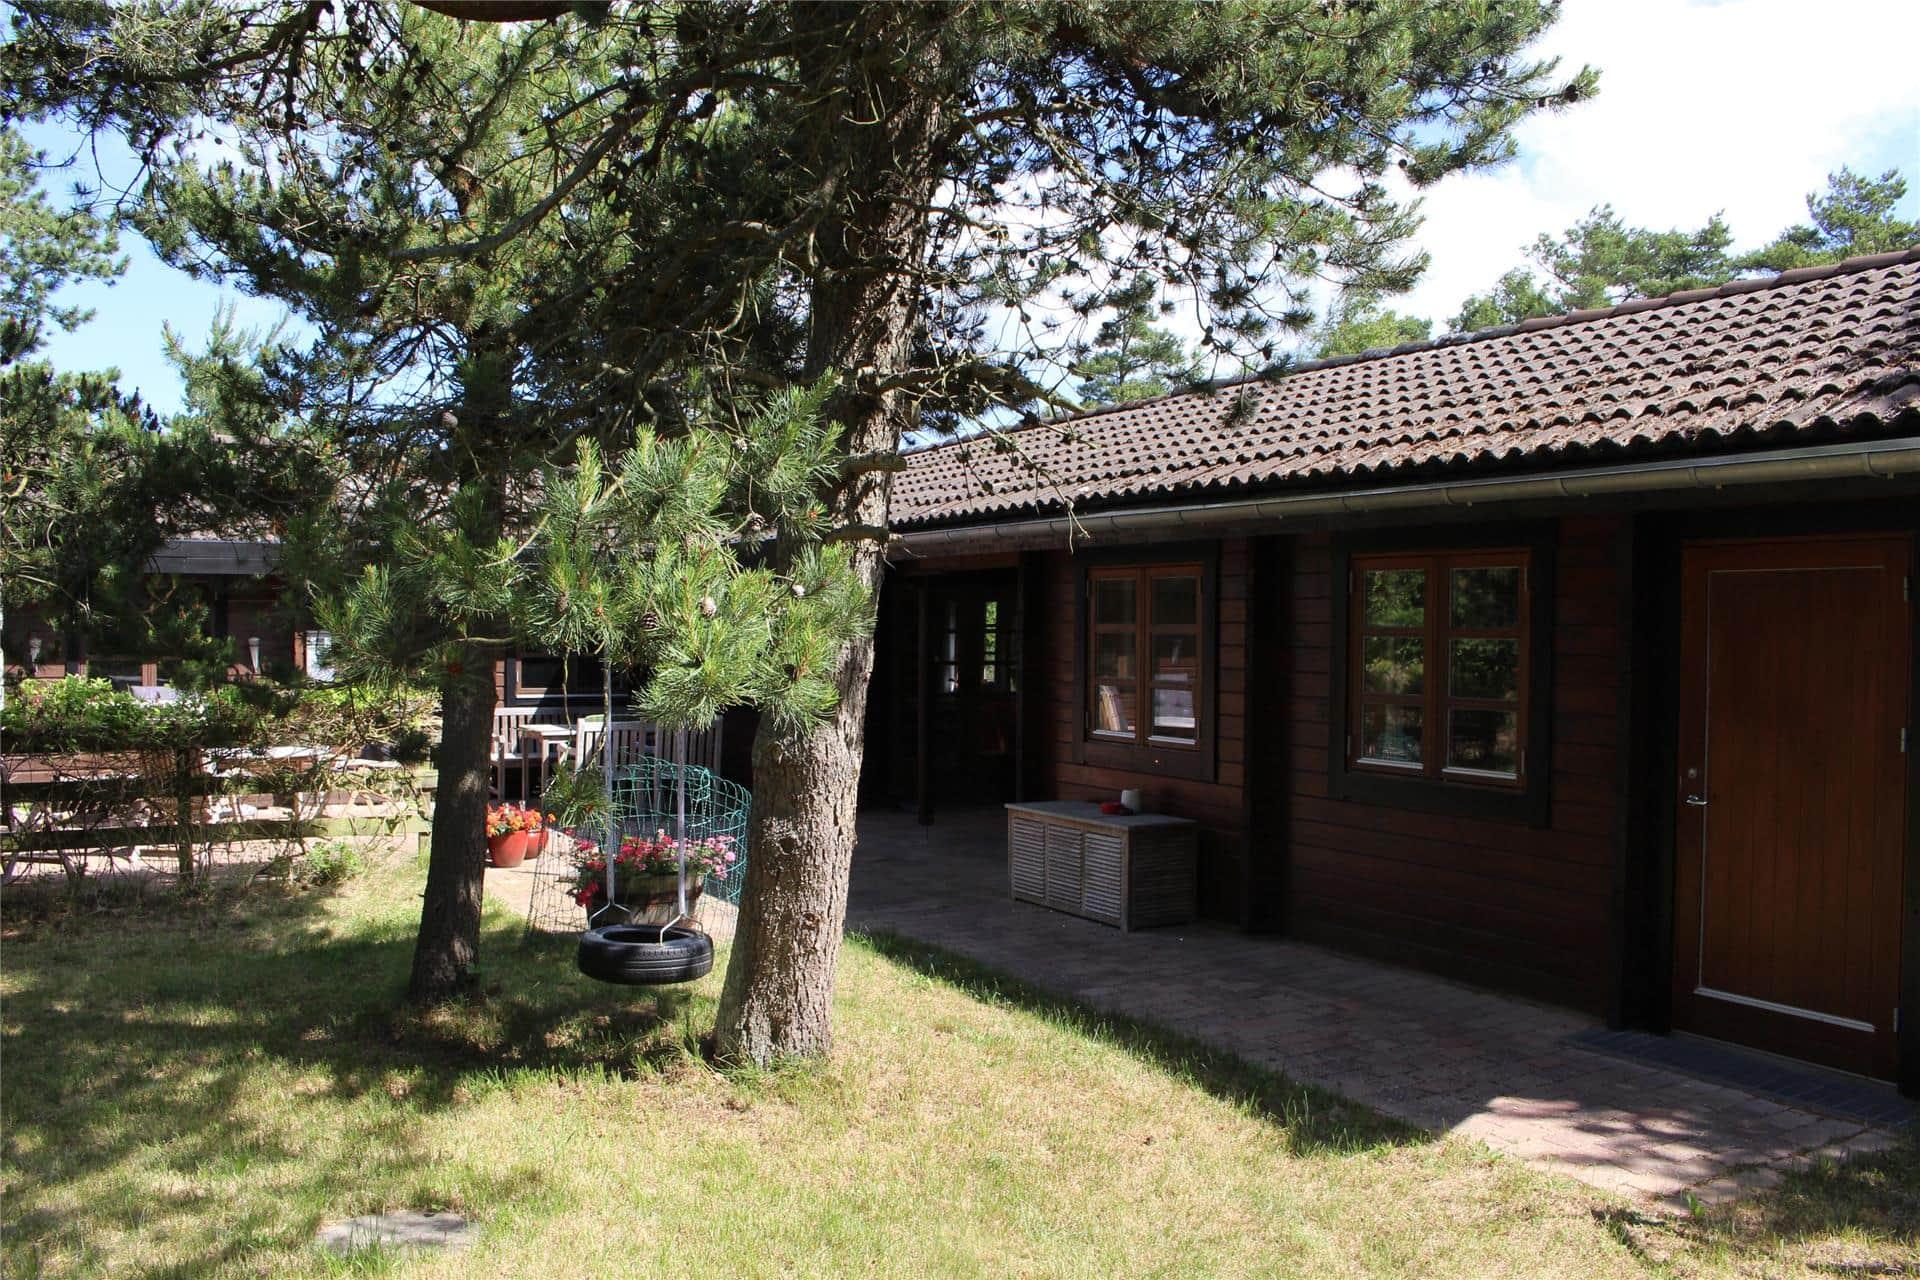 Image 1-17 Holiday-home 11111, Poppelvej 20, DK - 4500 Nykøbing Sj